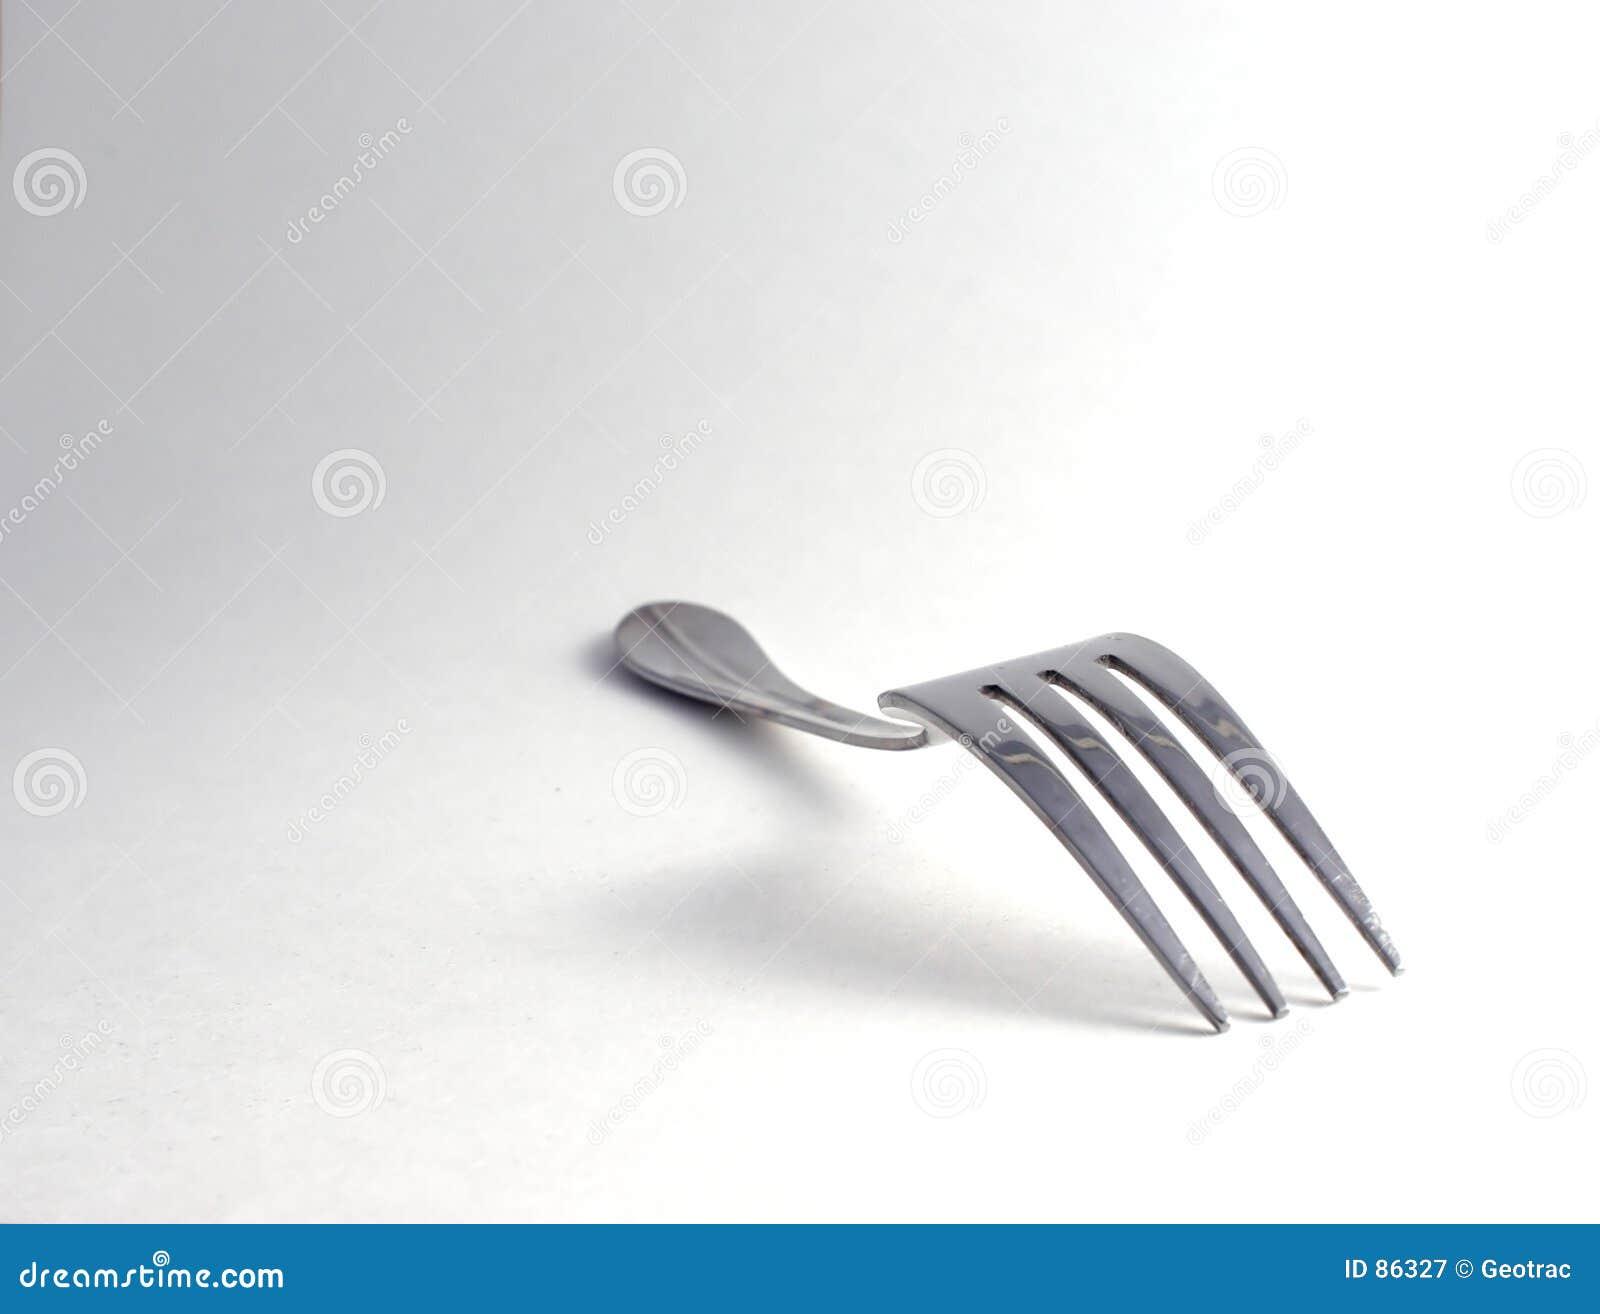 Fourchette de Tableau